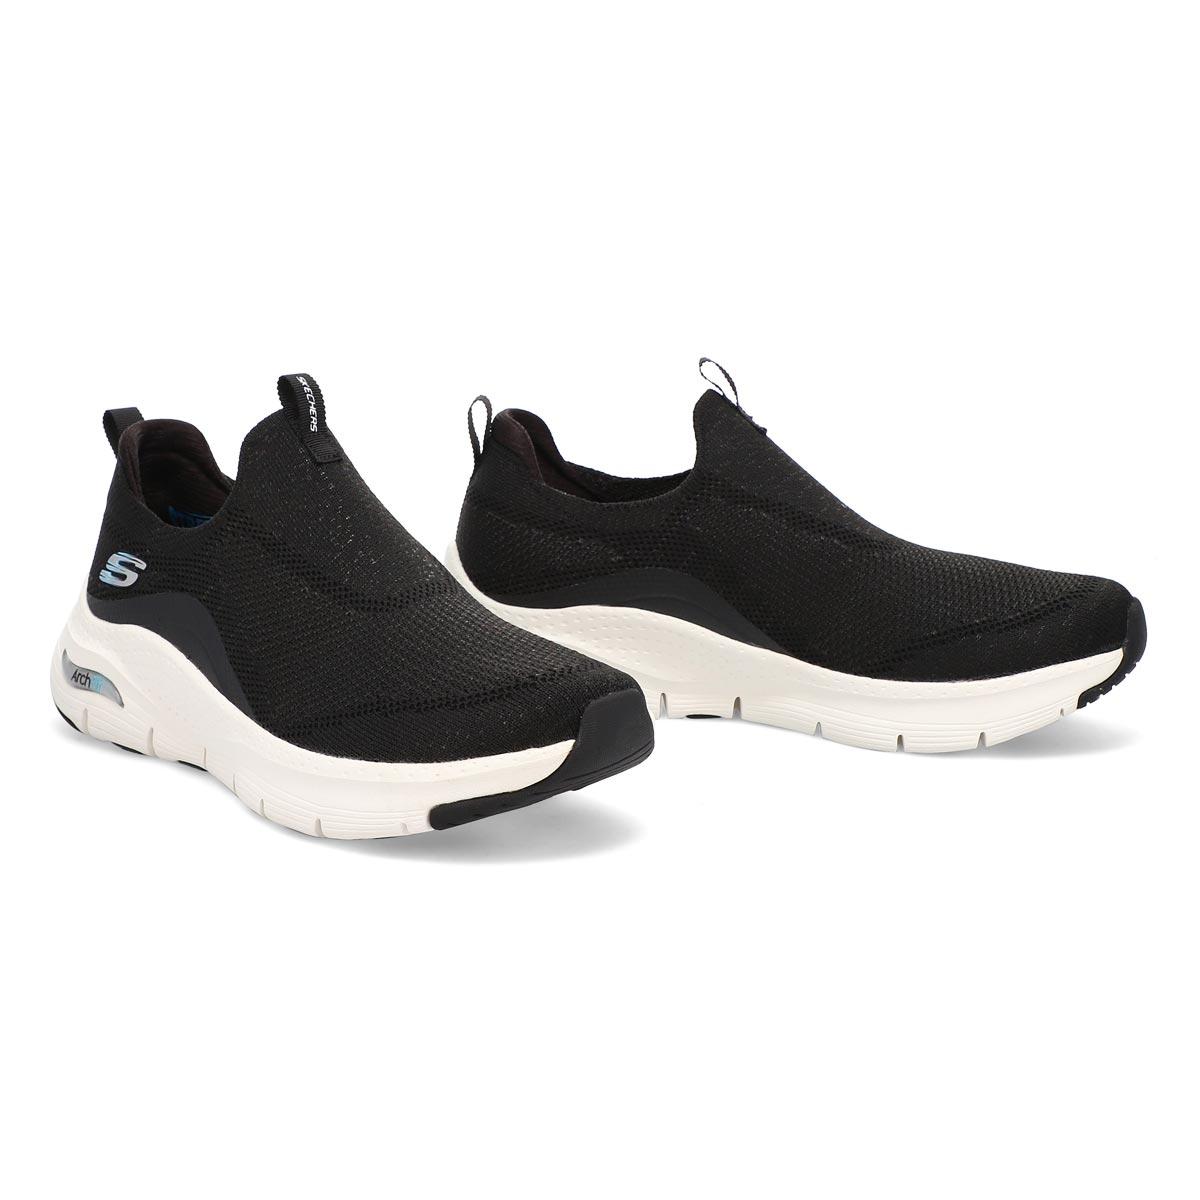 Women's Arch Fit Sneaker - Black/White